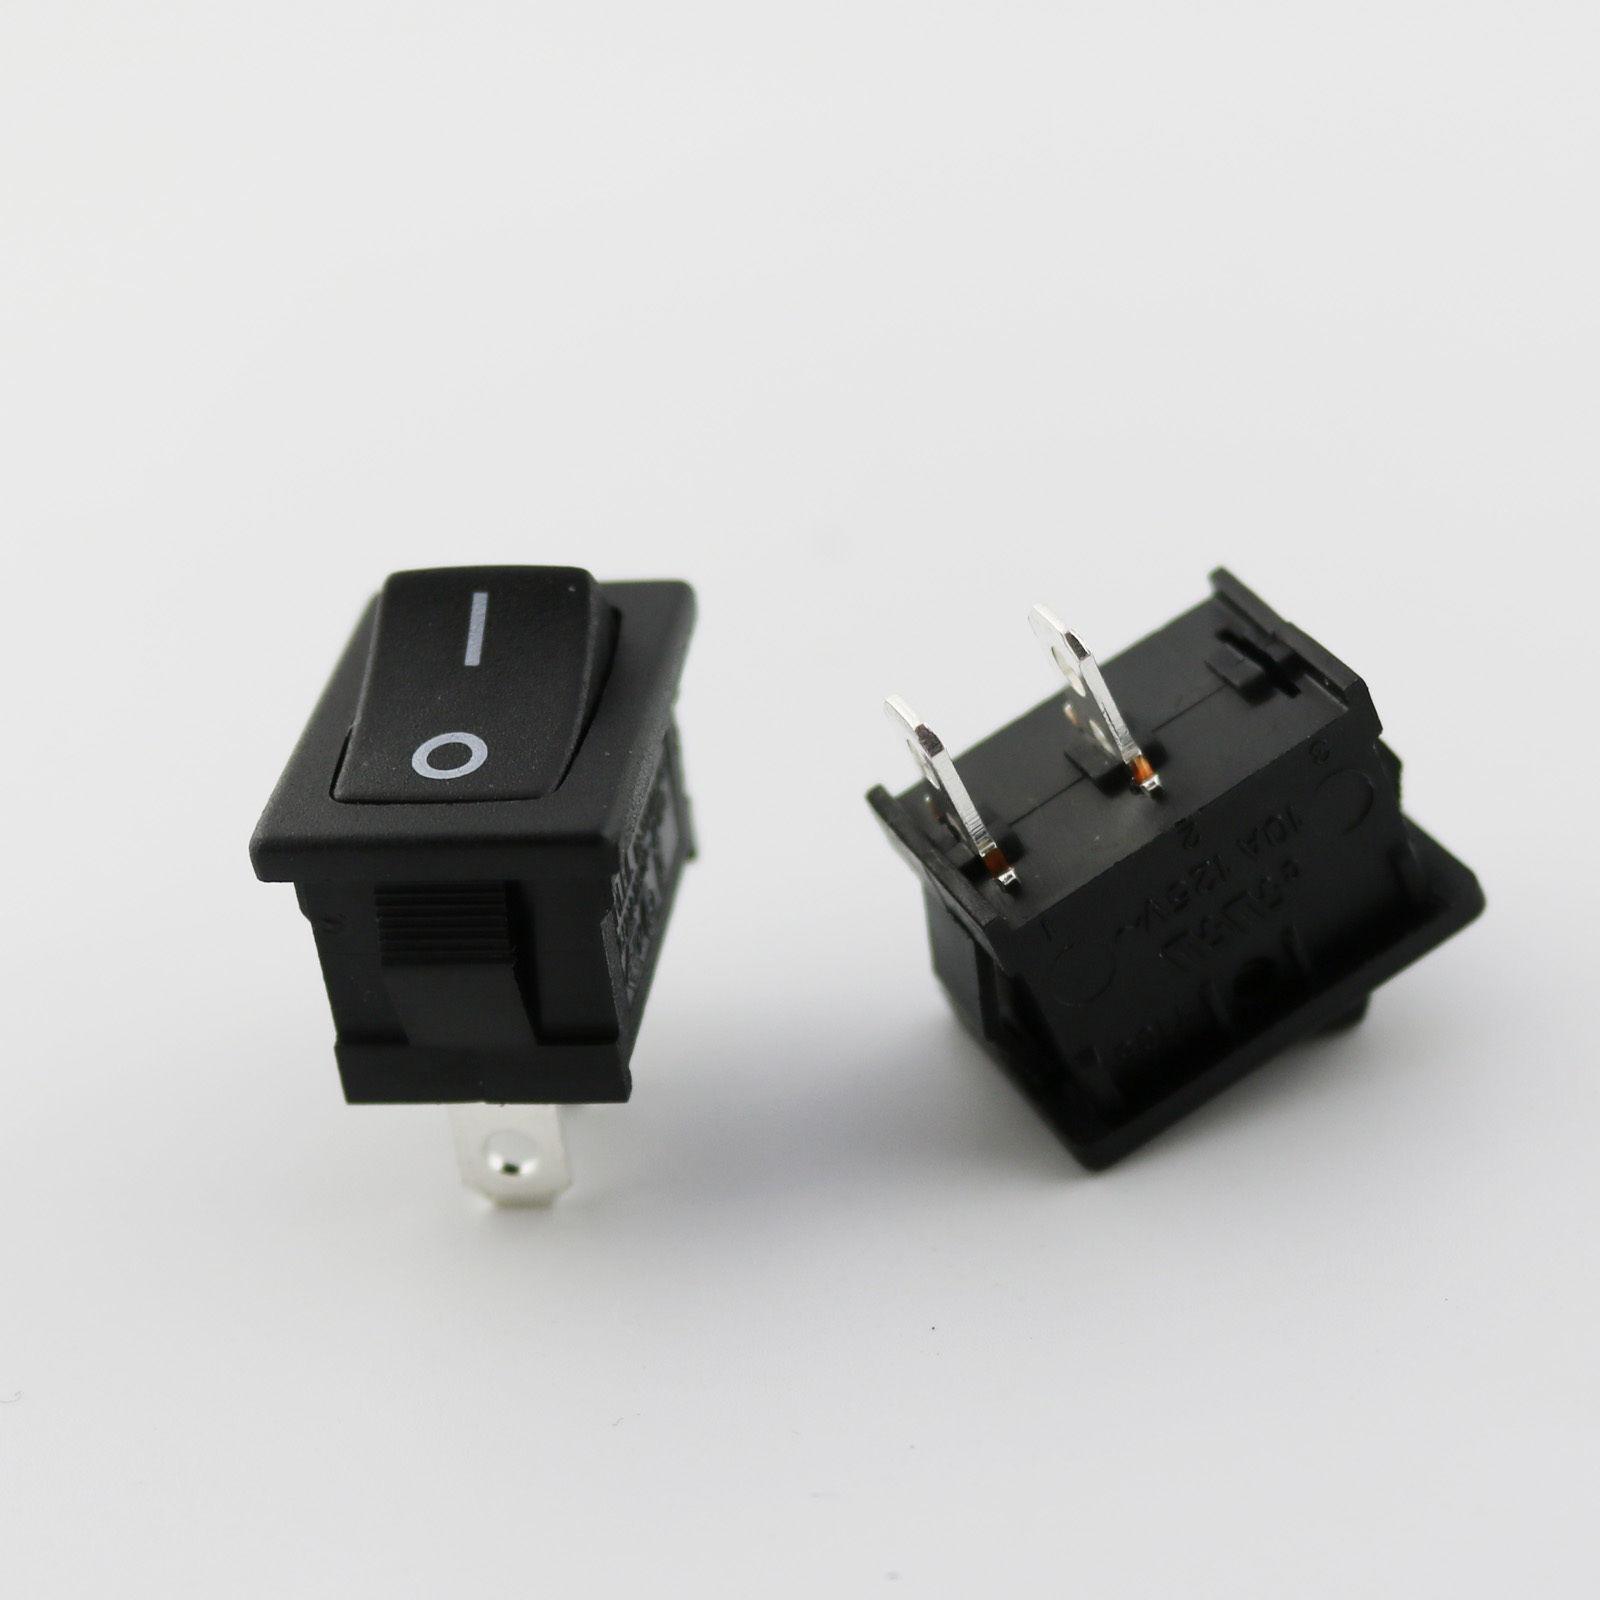 Black RLEIL Rocker Switch On/Off 2 Pin 2 Position DPST 10A/6A 125V ...